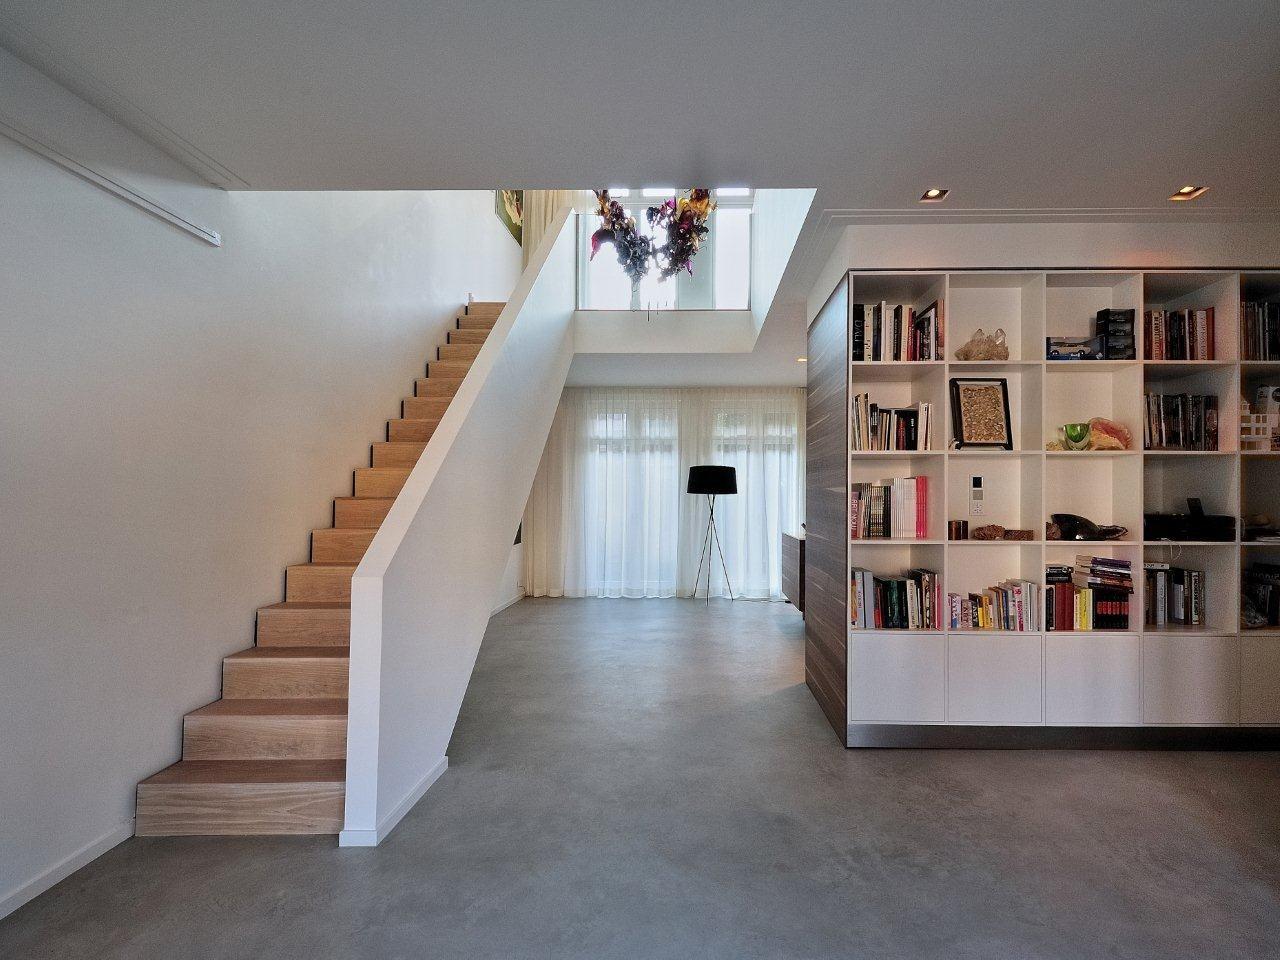 Betonnen vloer witte muren houten trap l ft